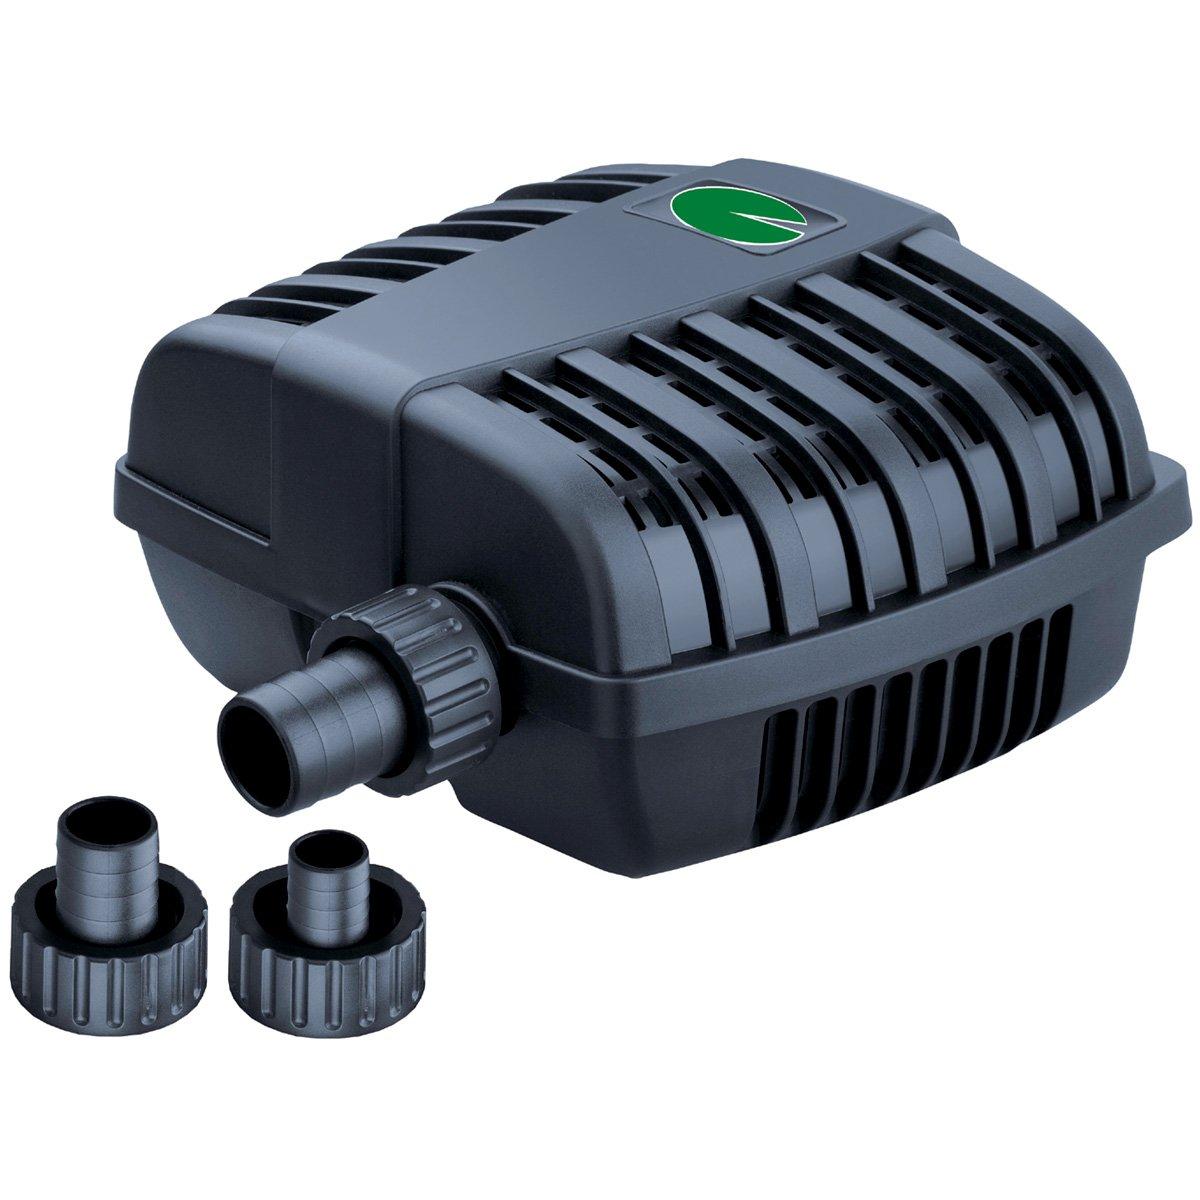 2500 Litres Per Hour PondXpert Mighty Mite Pond Pumps (2500 Litres Per Hour)